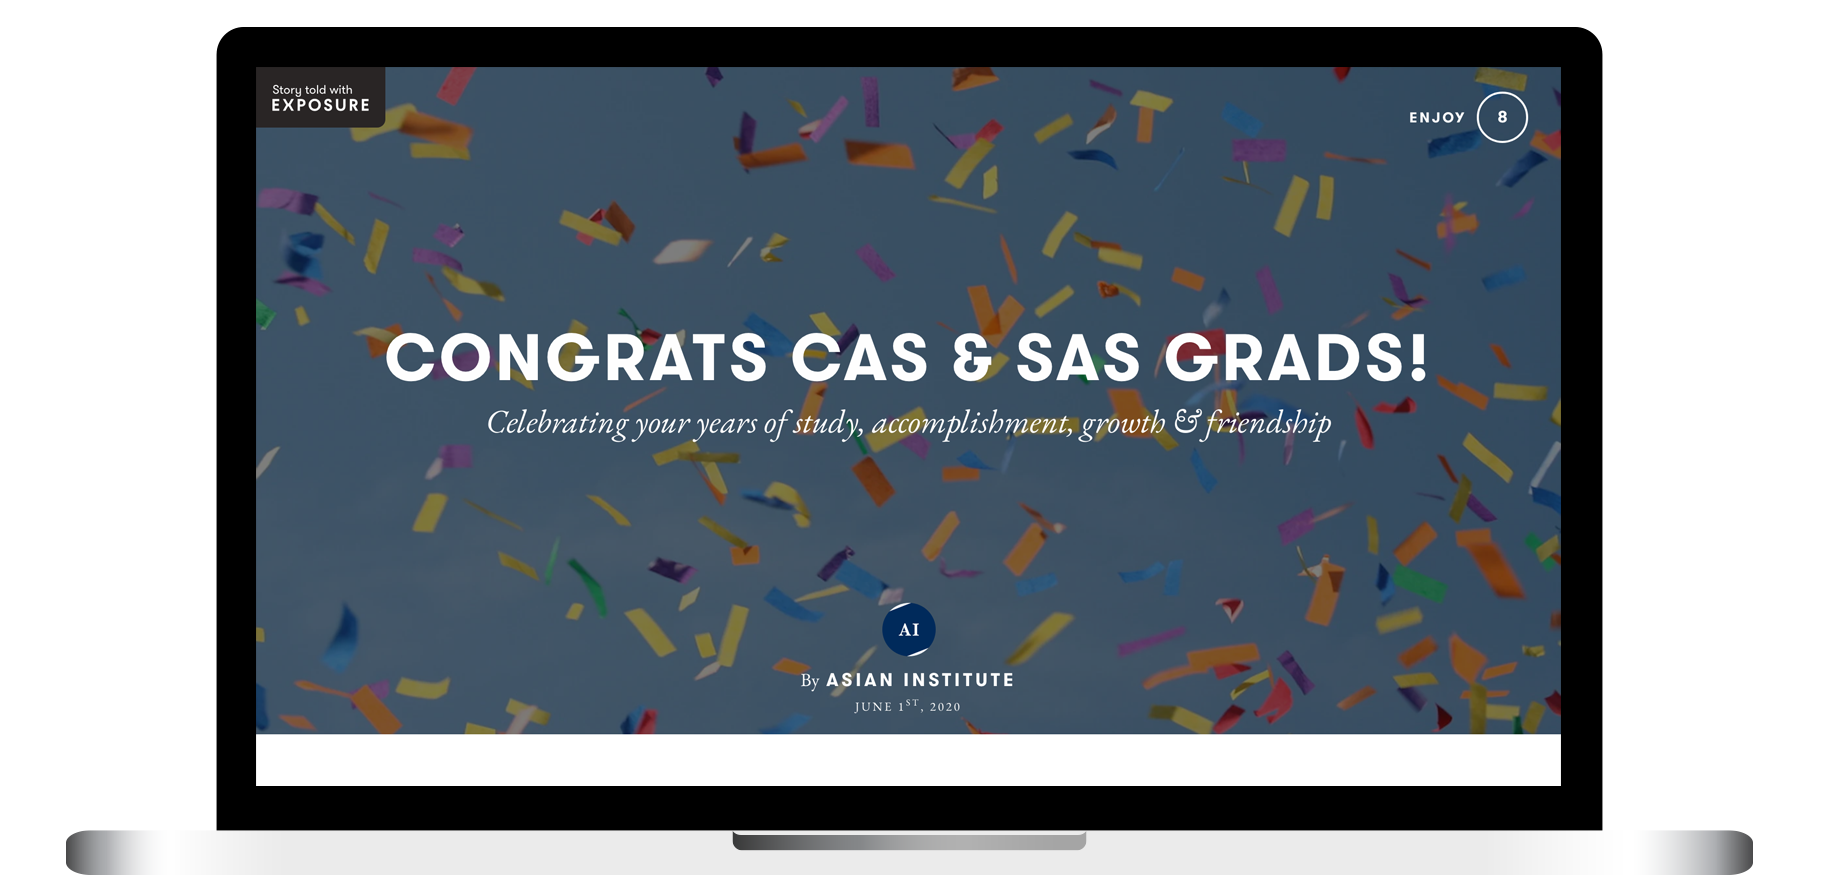 Asian Institute Website to Congrat Convocation 2020